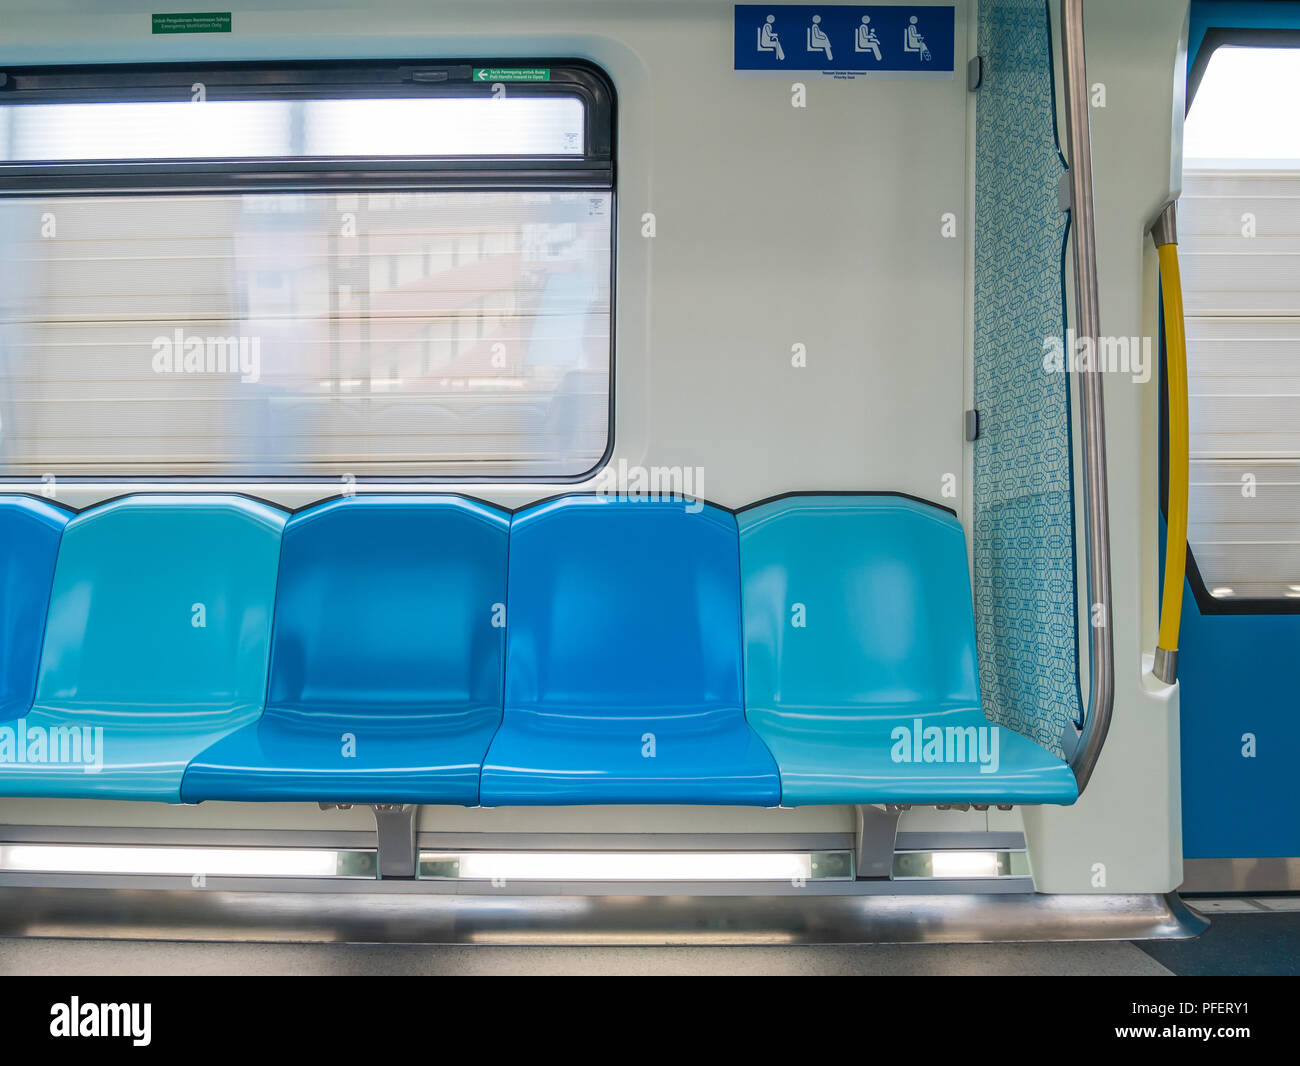 Malaysia's MRT (Mass Rapid Transit) priority seats. Stock Photo